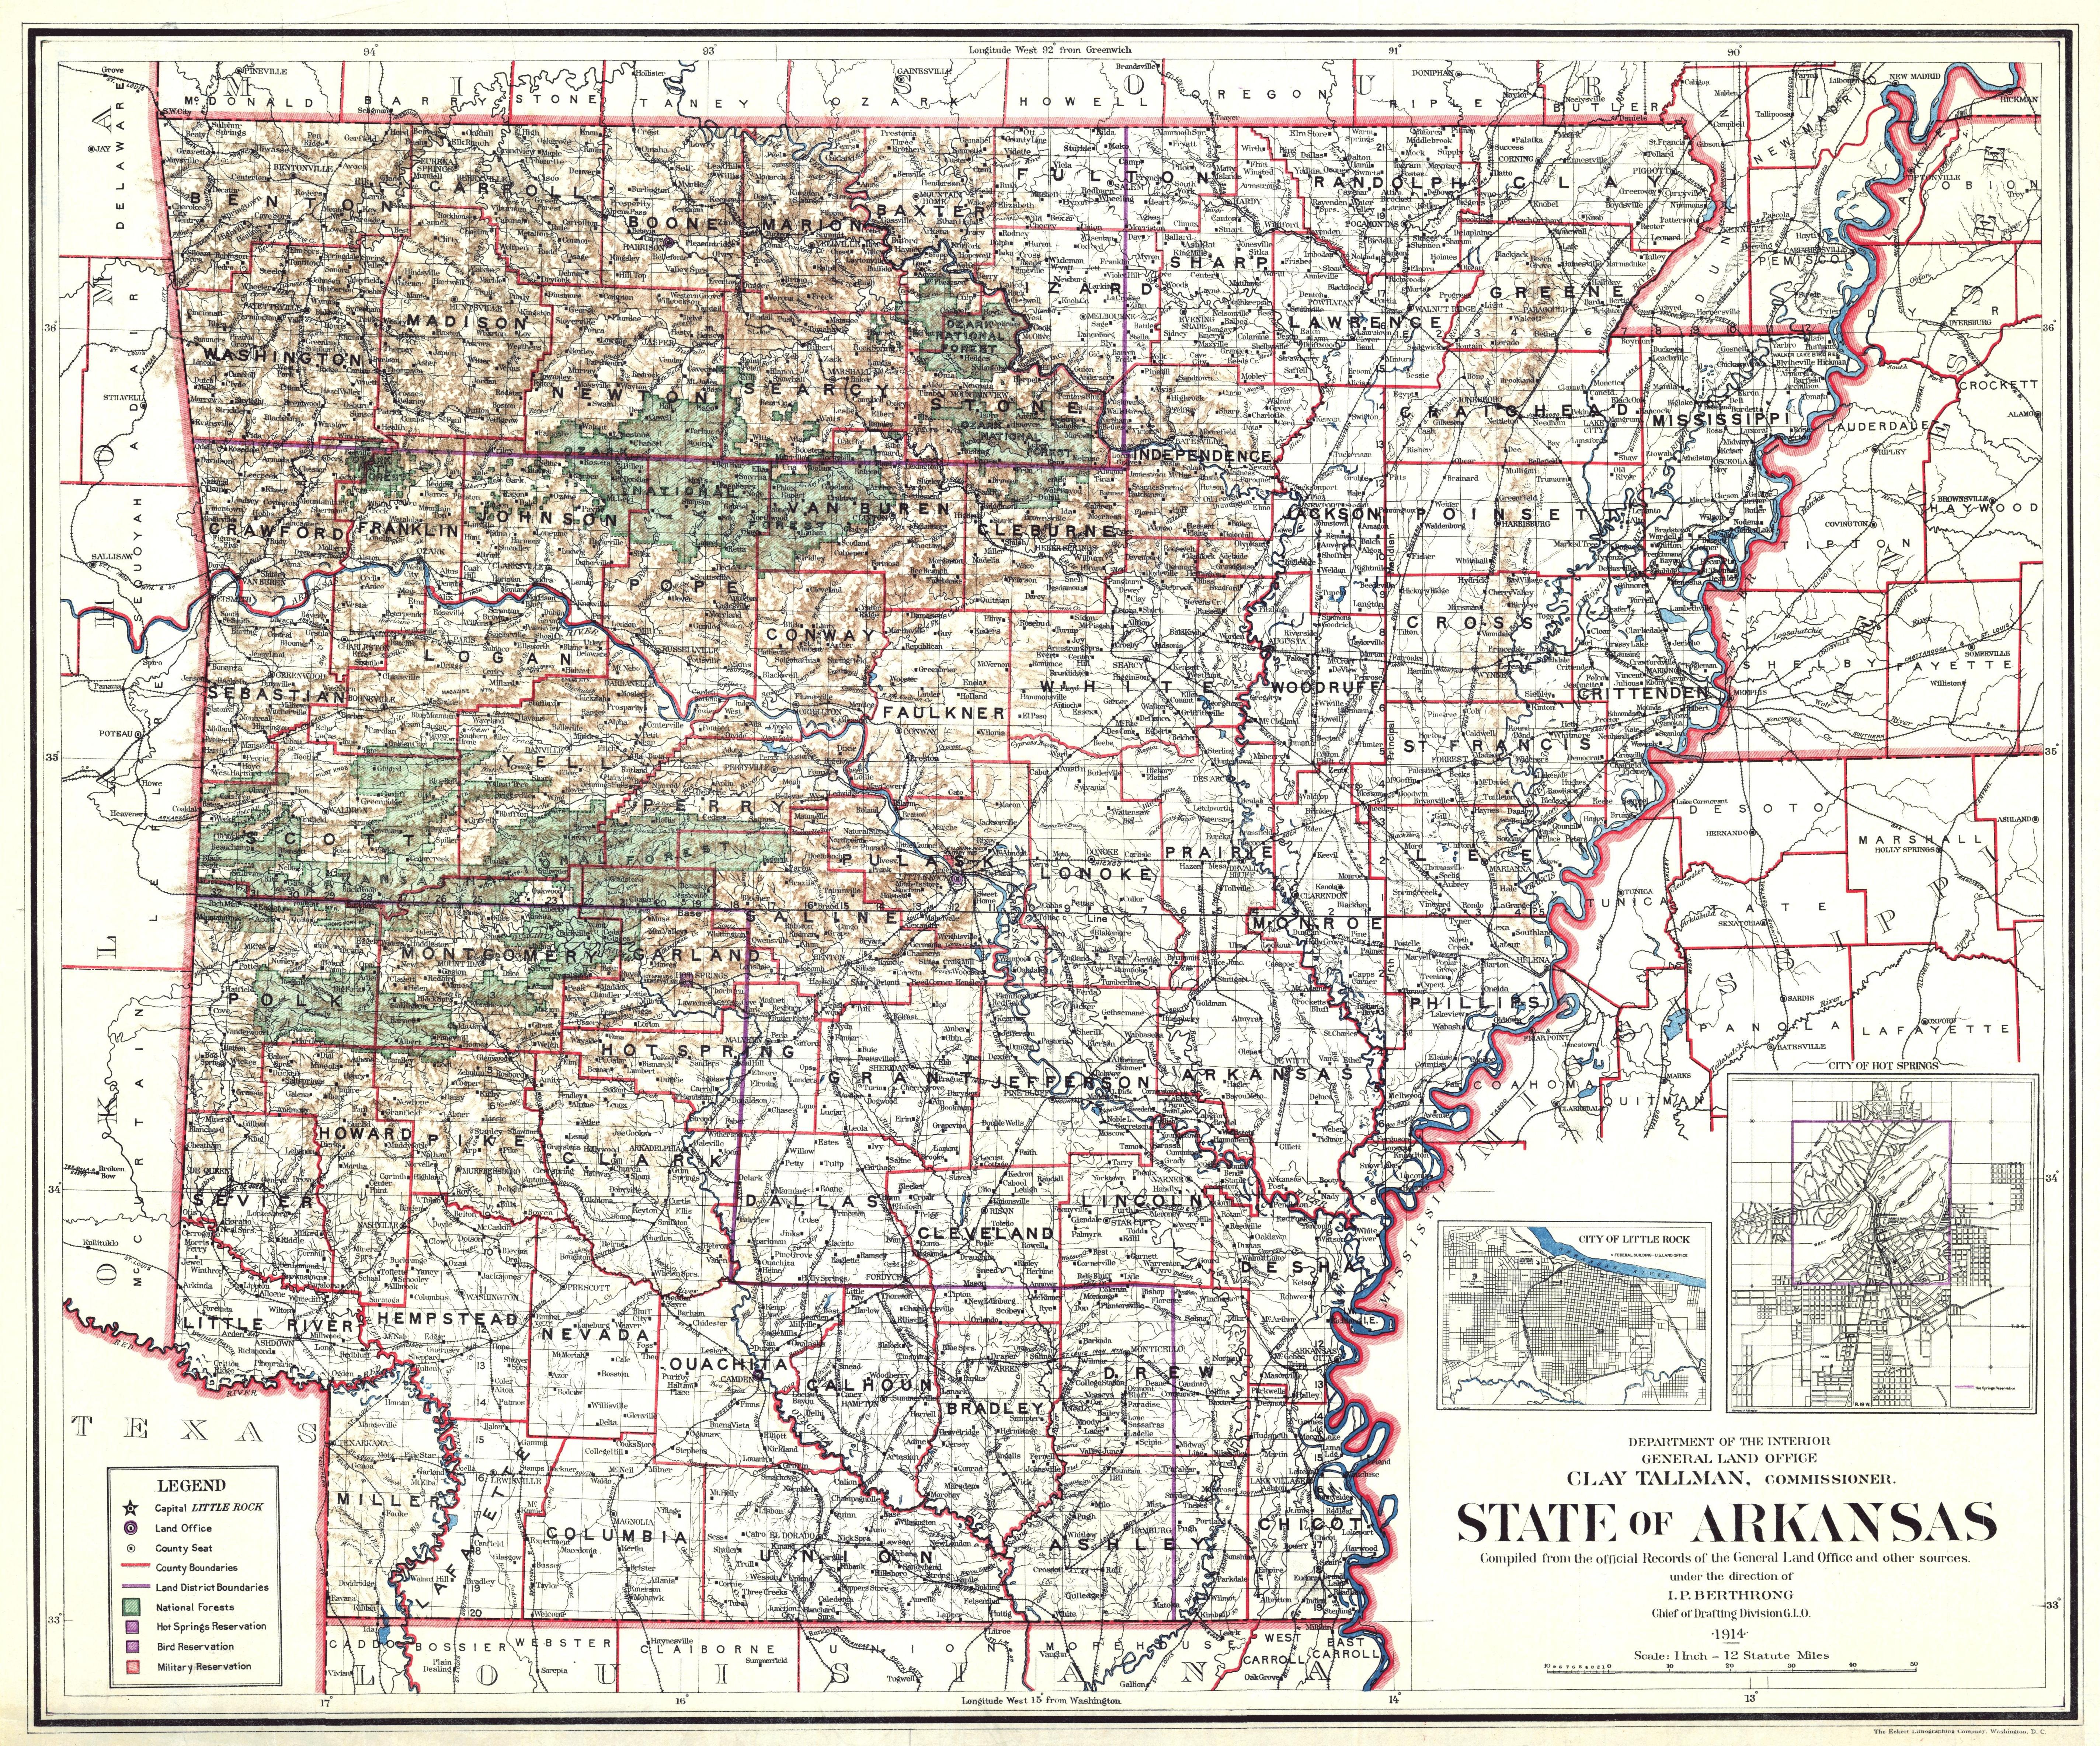 File:Arkansas State Map, 1914.jpg - Wikimedia Commons